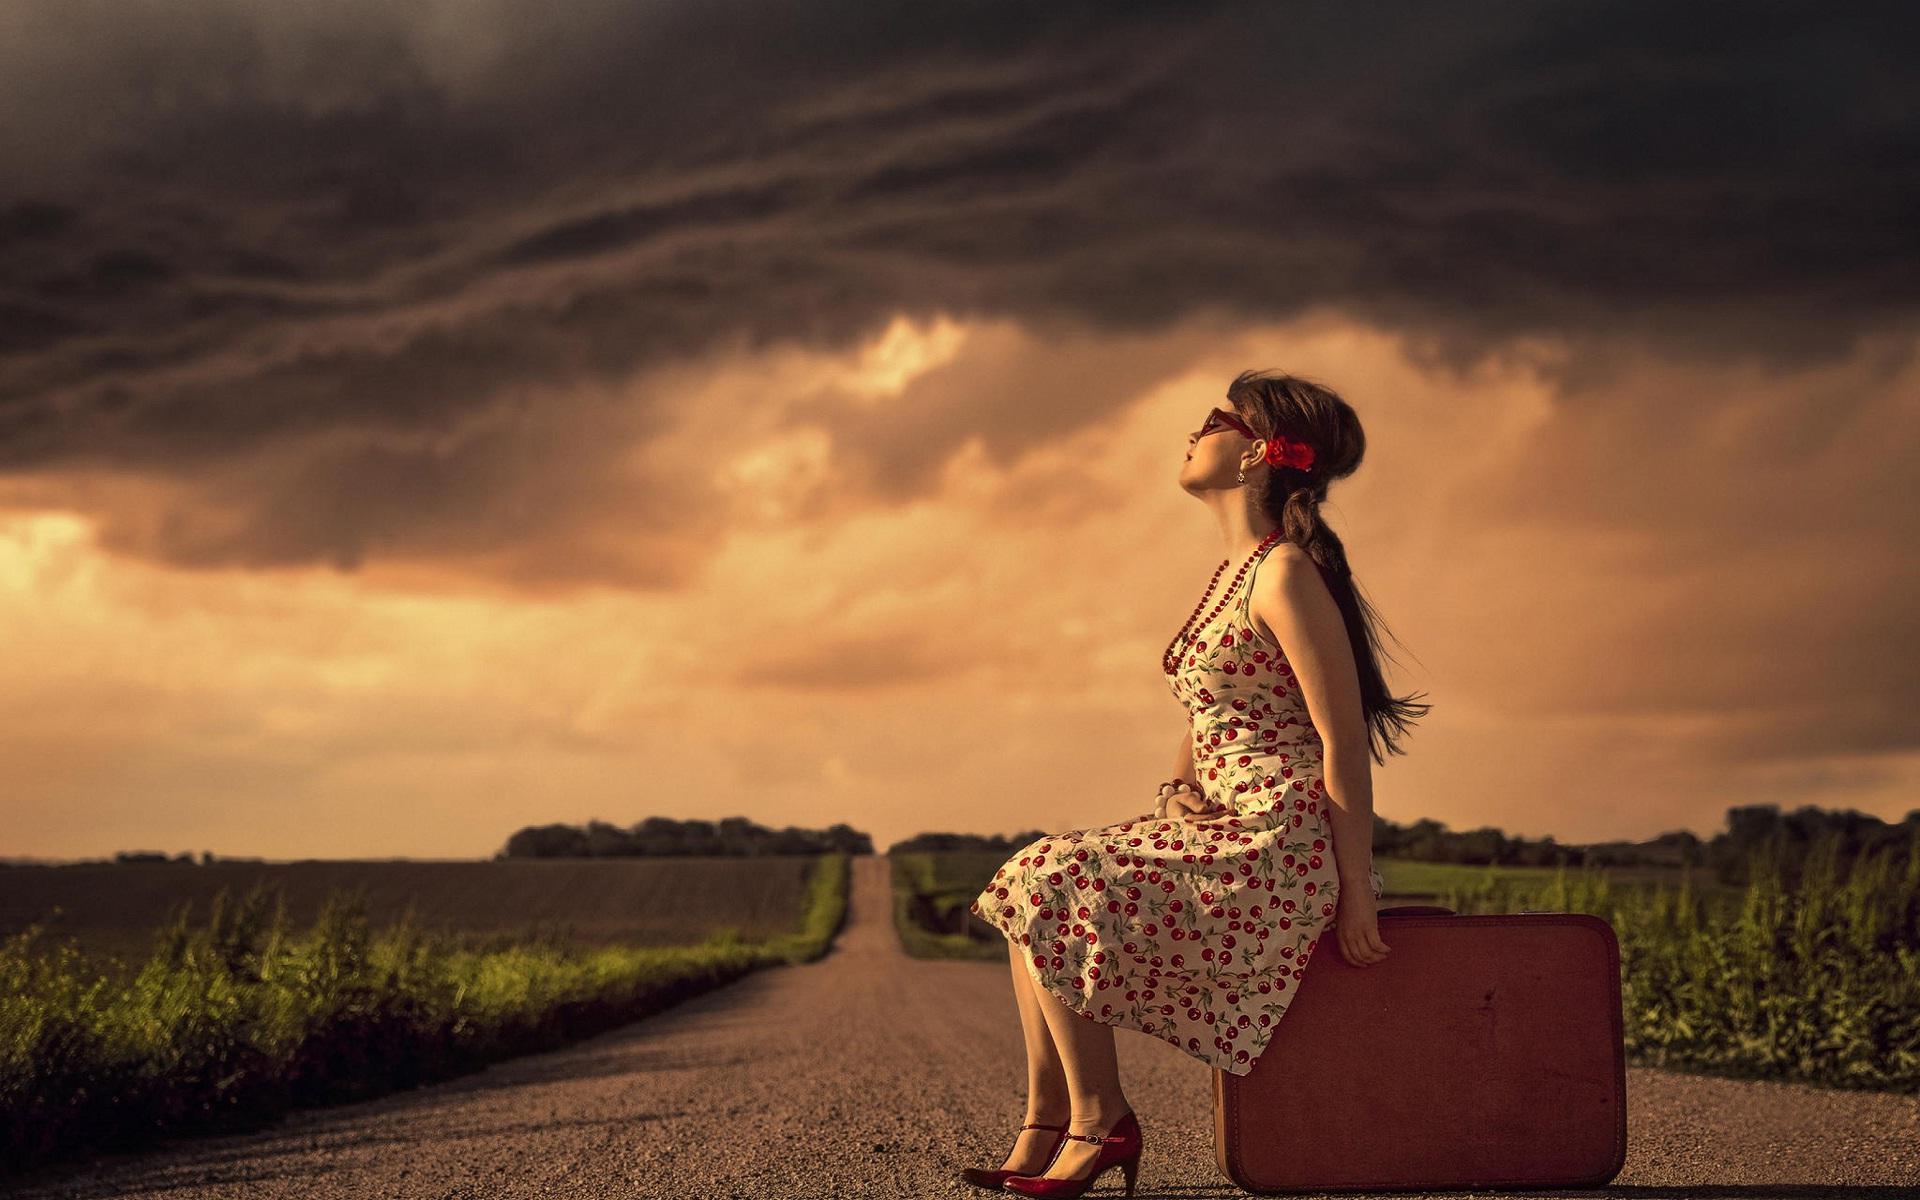 Alone Girl On Road Hd Wallpapers Wallpaperscharlie - Sad Two Line Romantic Shayari In Hindi - HD Wallpaper